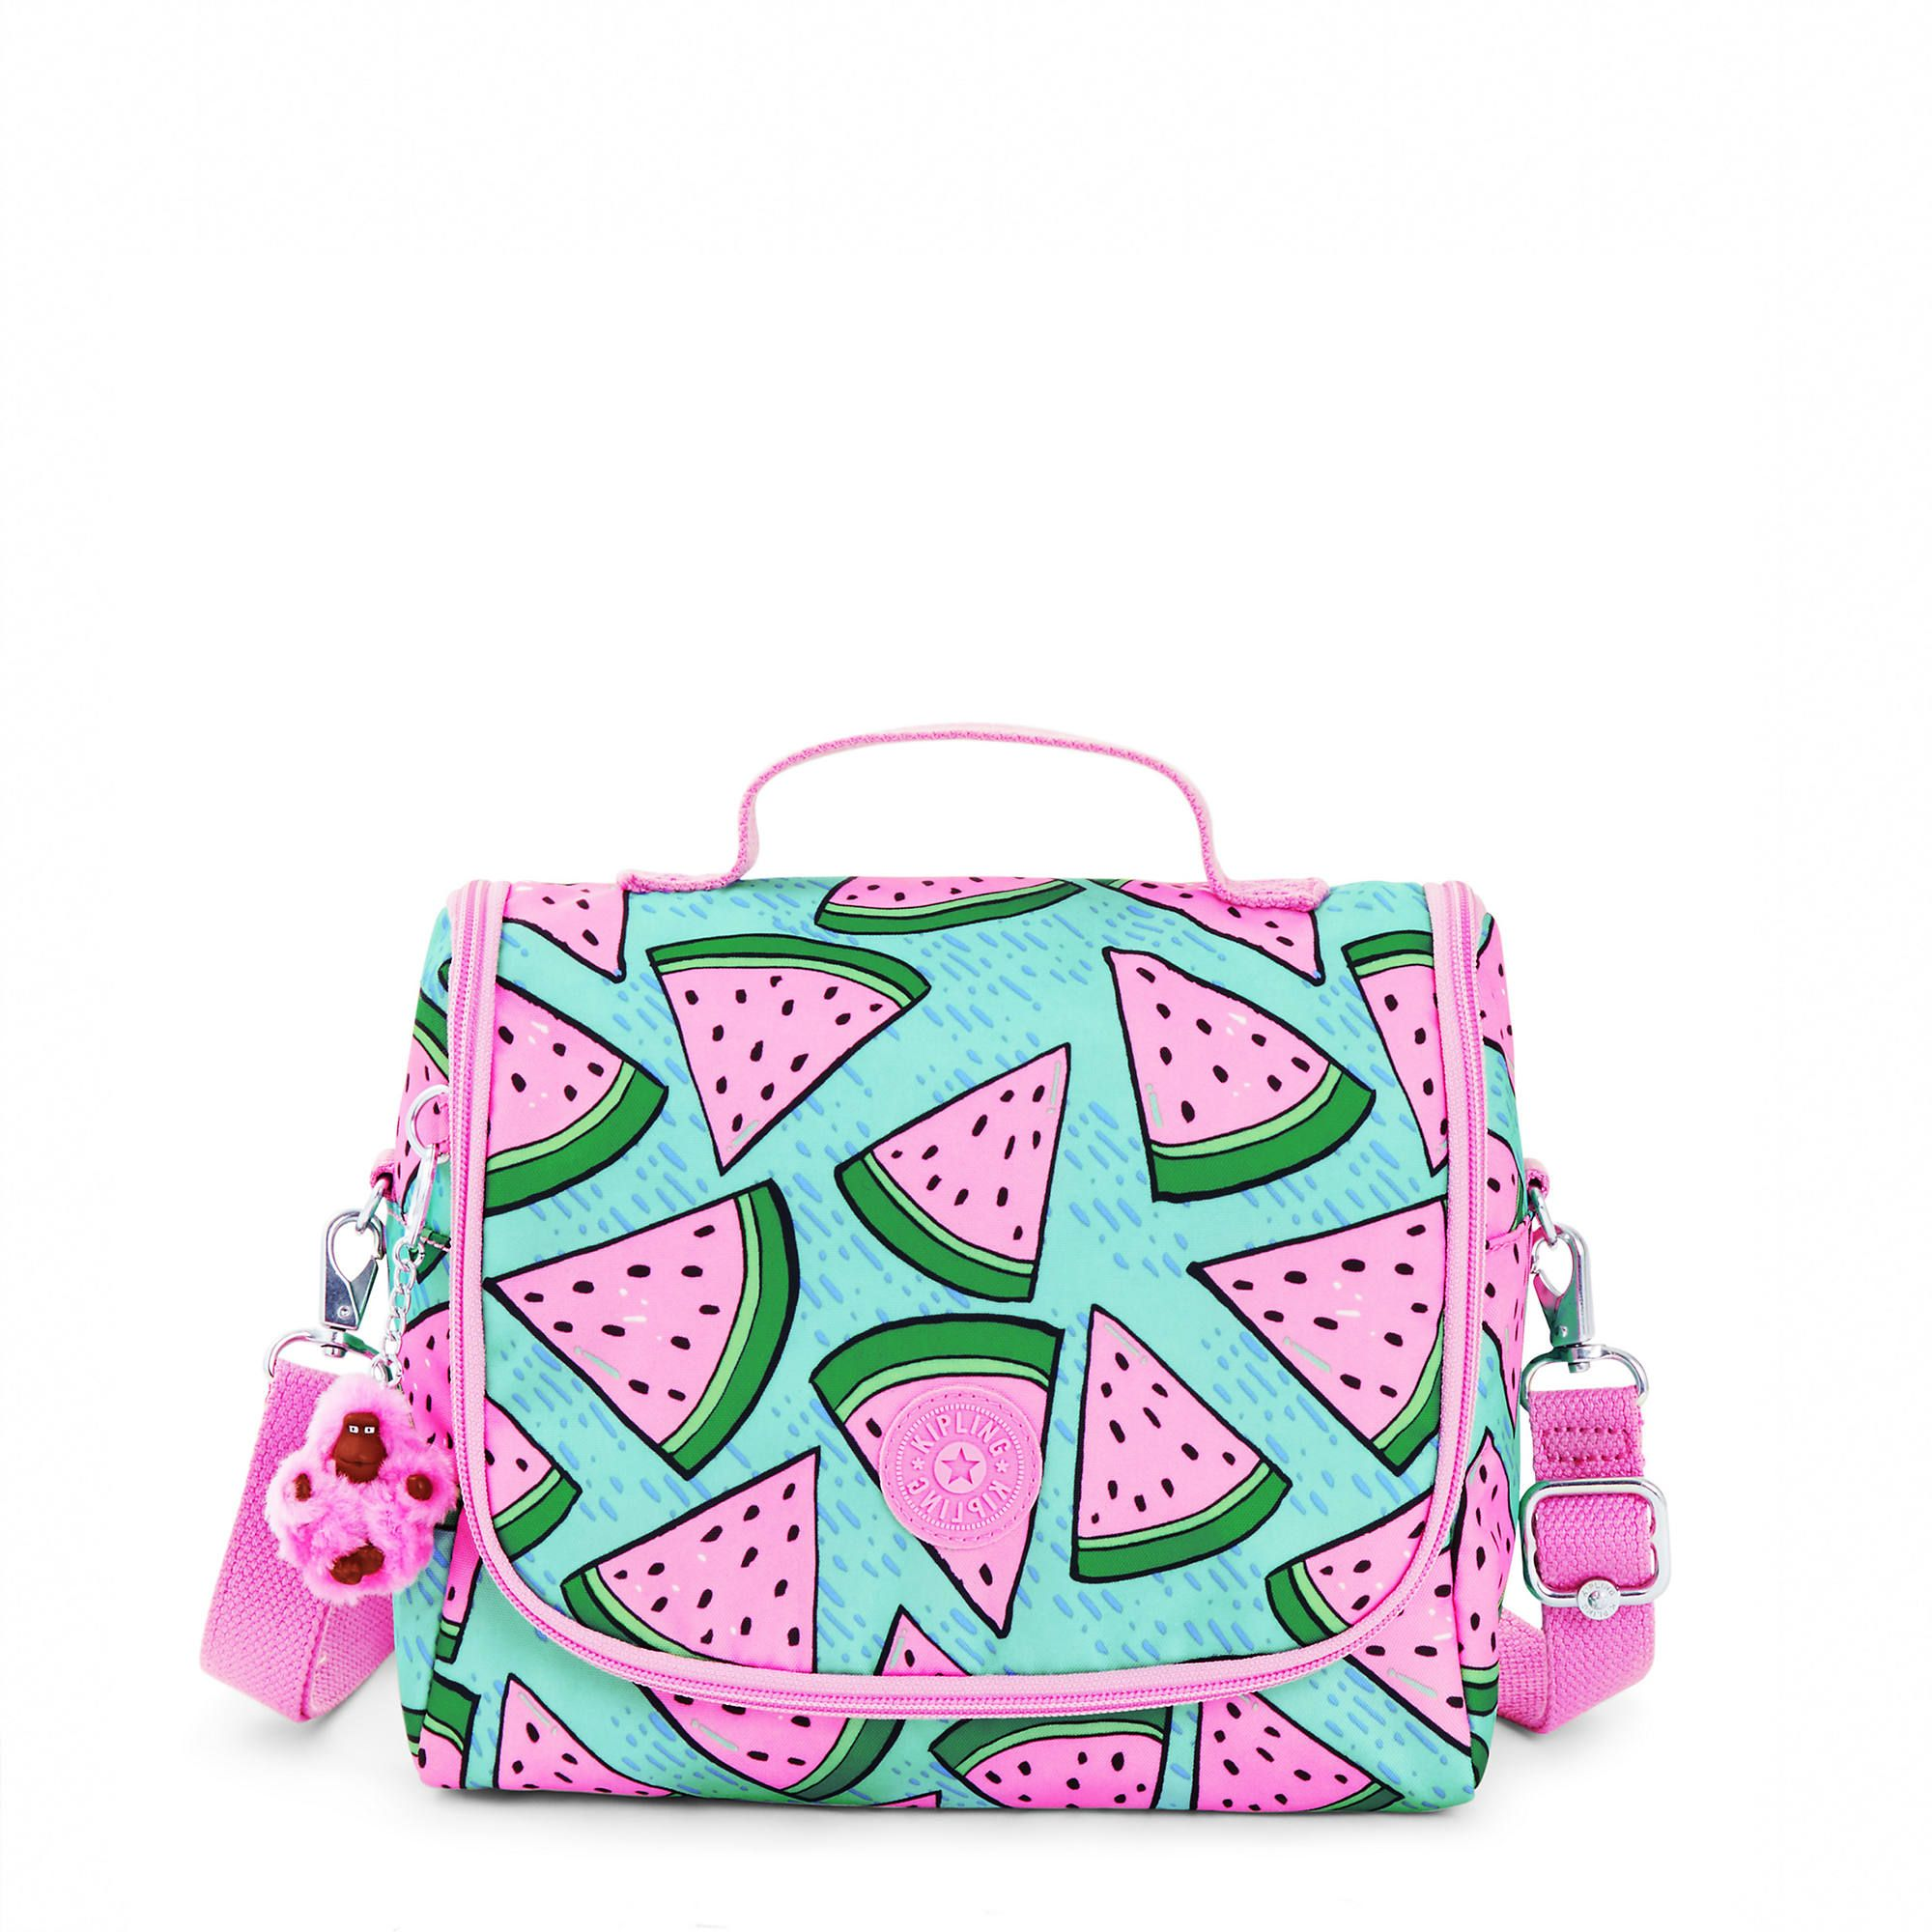 4a0981e3688 Kichirou Printed Lunch Bag | kipling bags | Kipling lunch bag ...